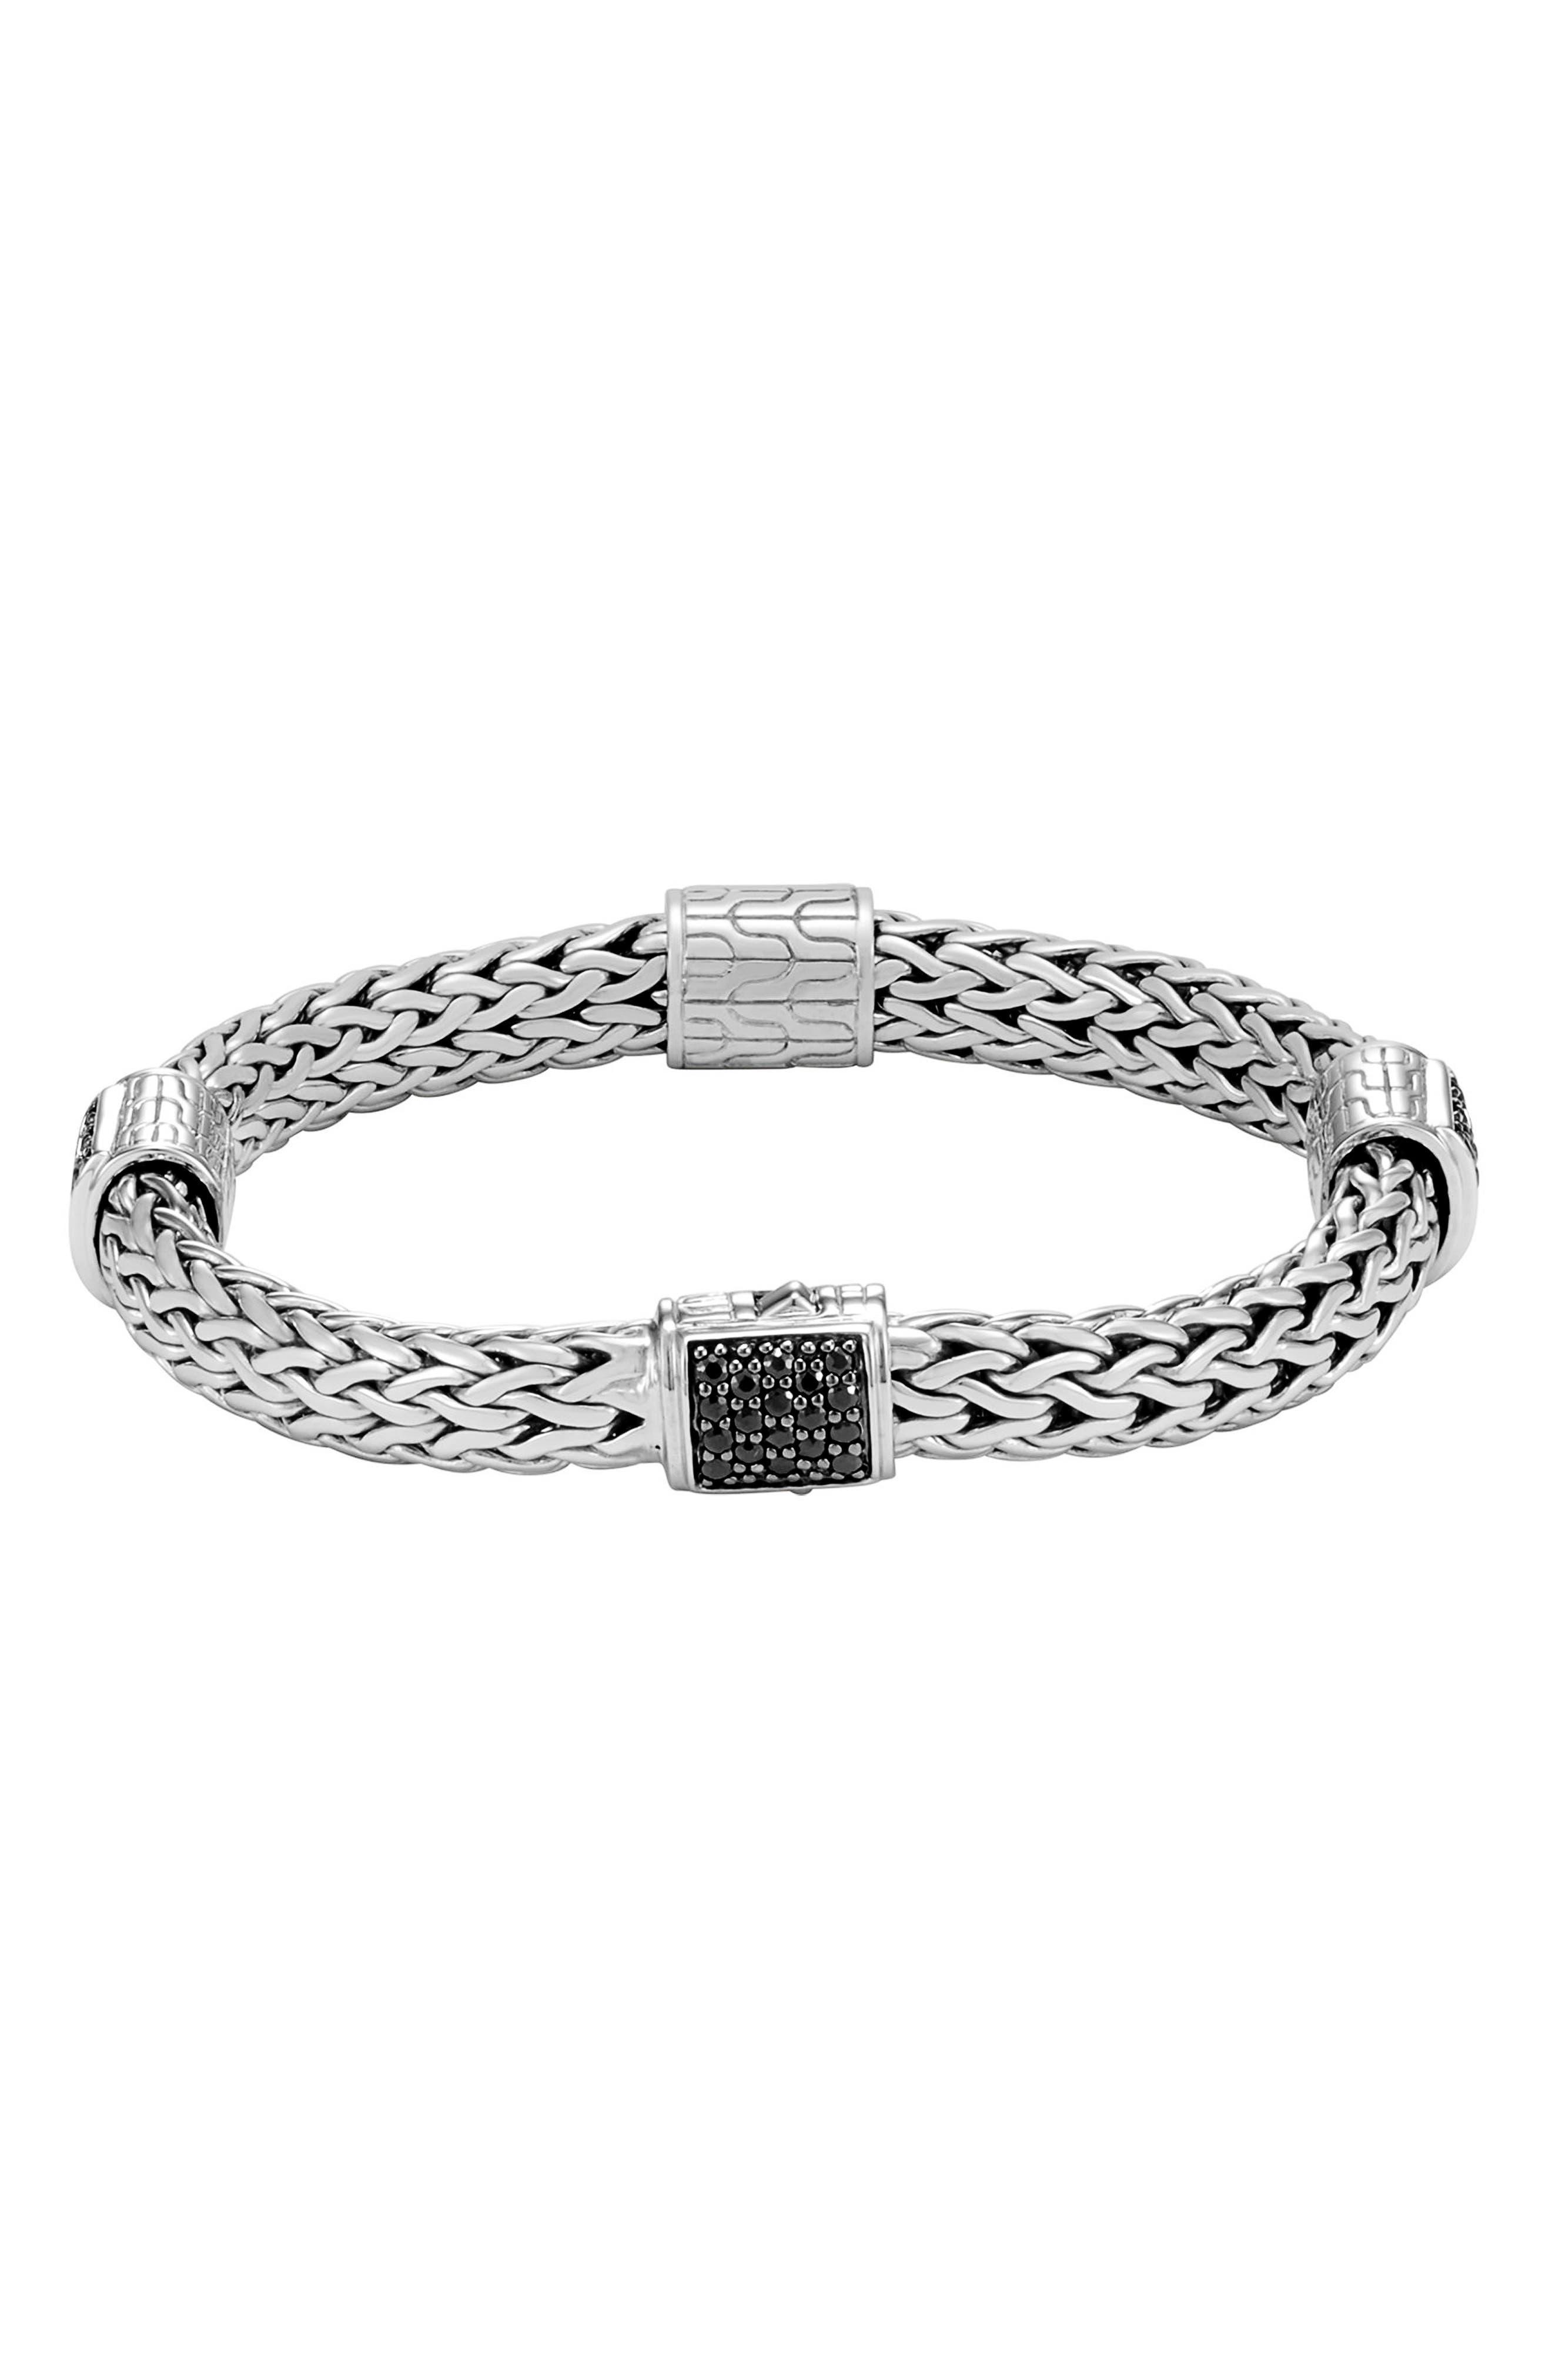 John Hardy Classic Medium Link Chain Bracelet